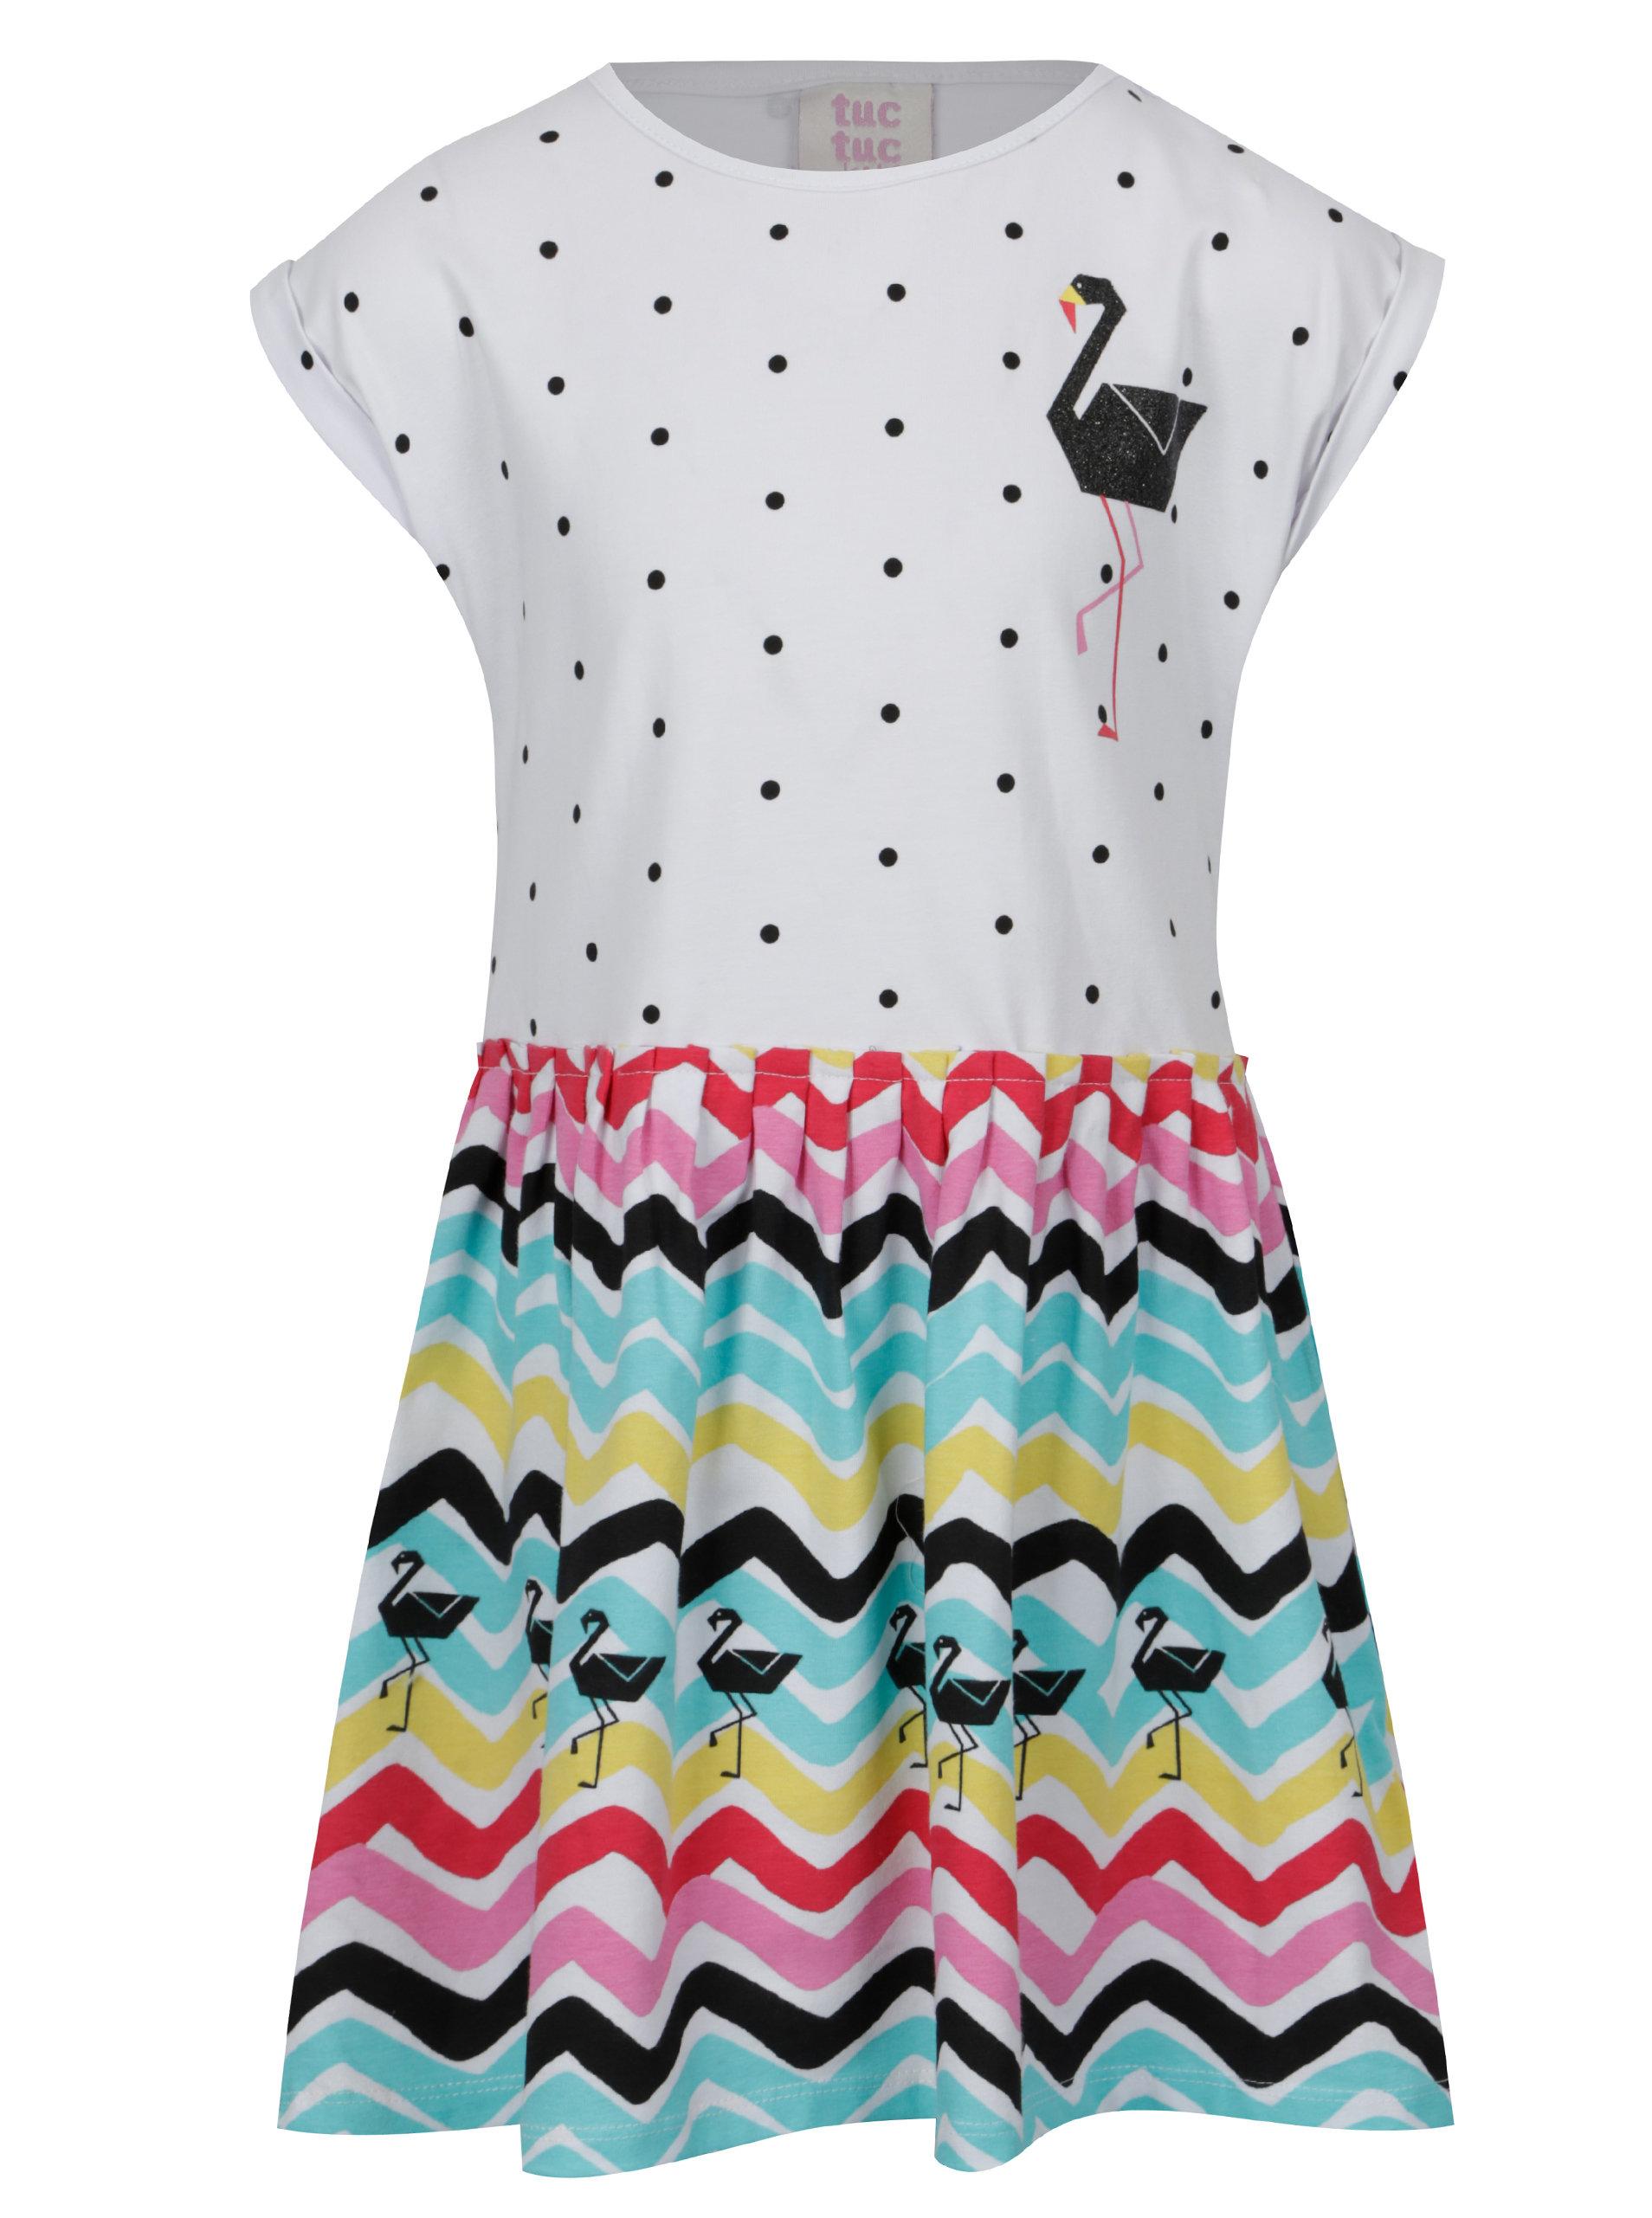 cd490bb24eee Zeleno-biele vzorované dievčenské šaty tuc tuc Combined Jersey ...